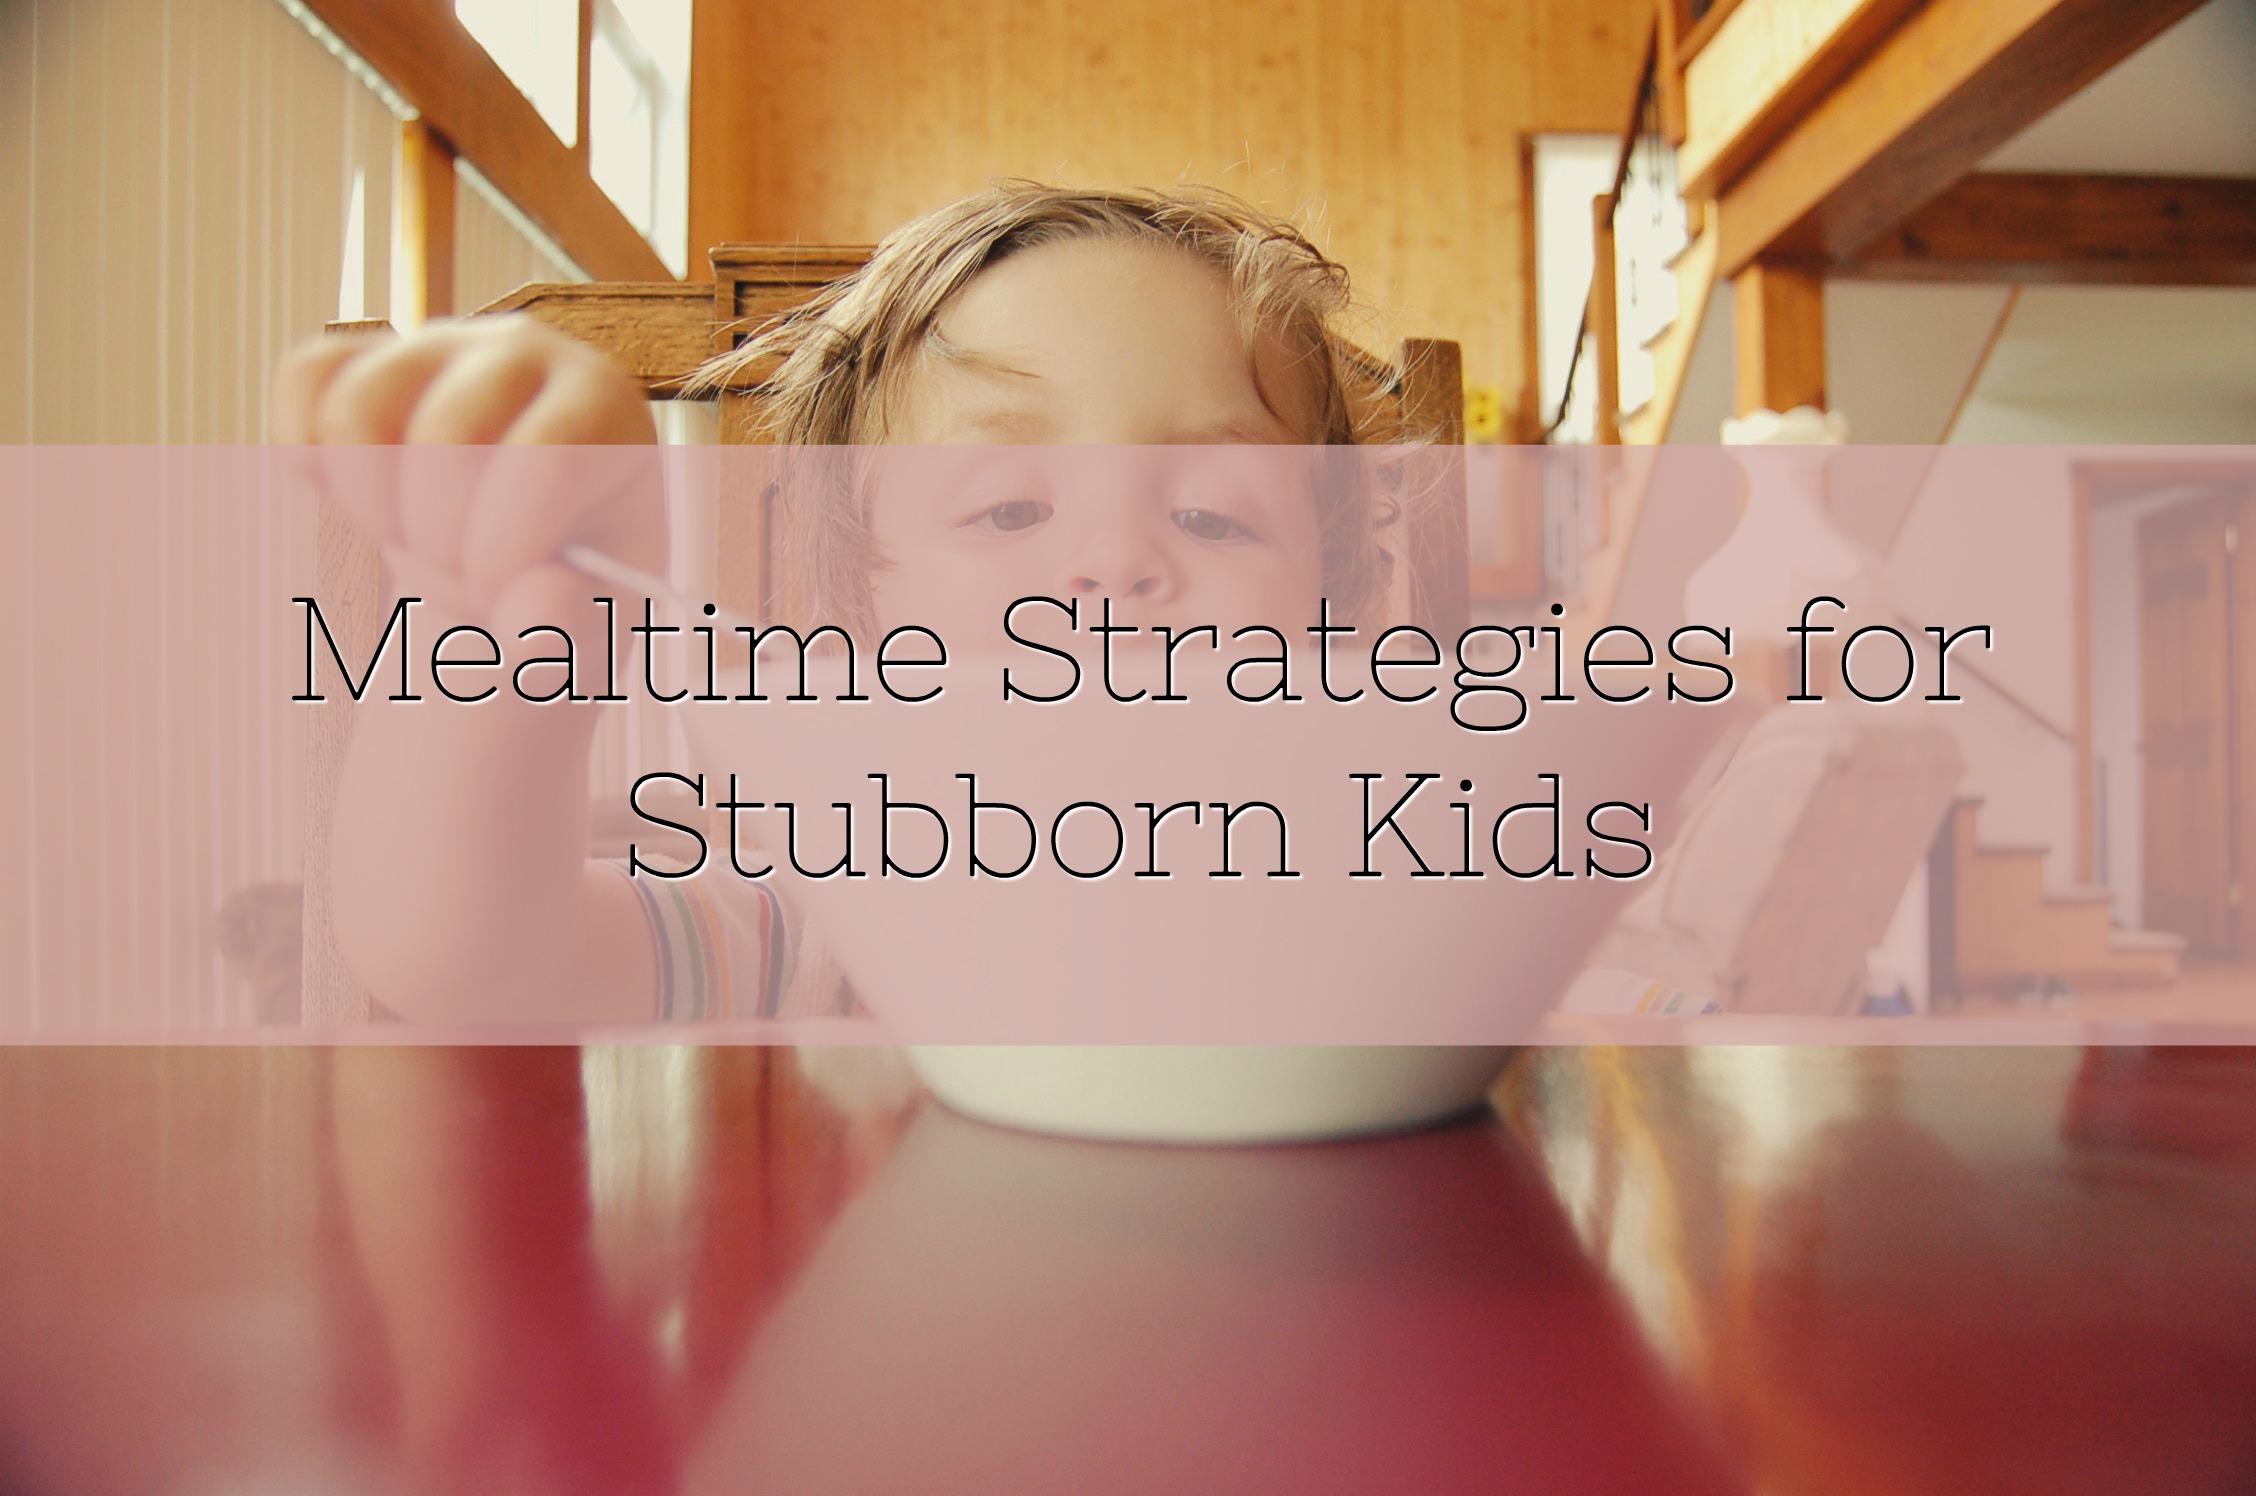 Mealtime Strategies for Stubborn Kids